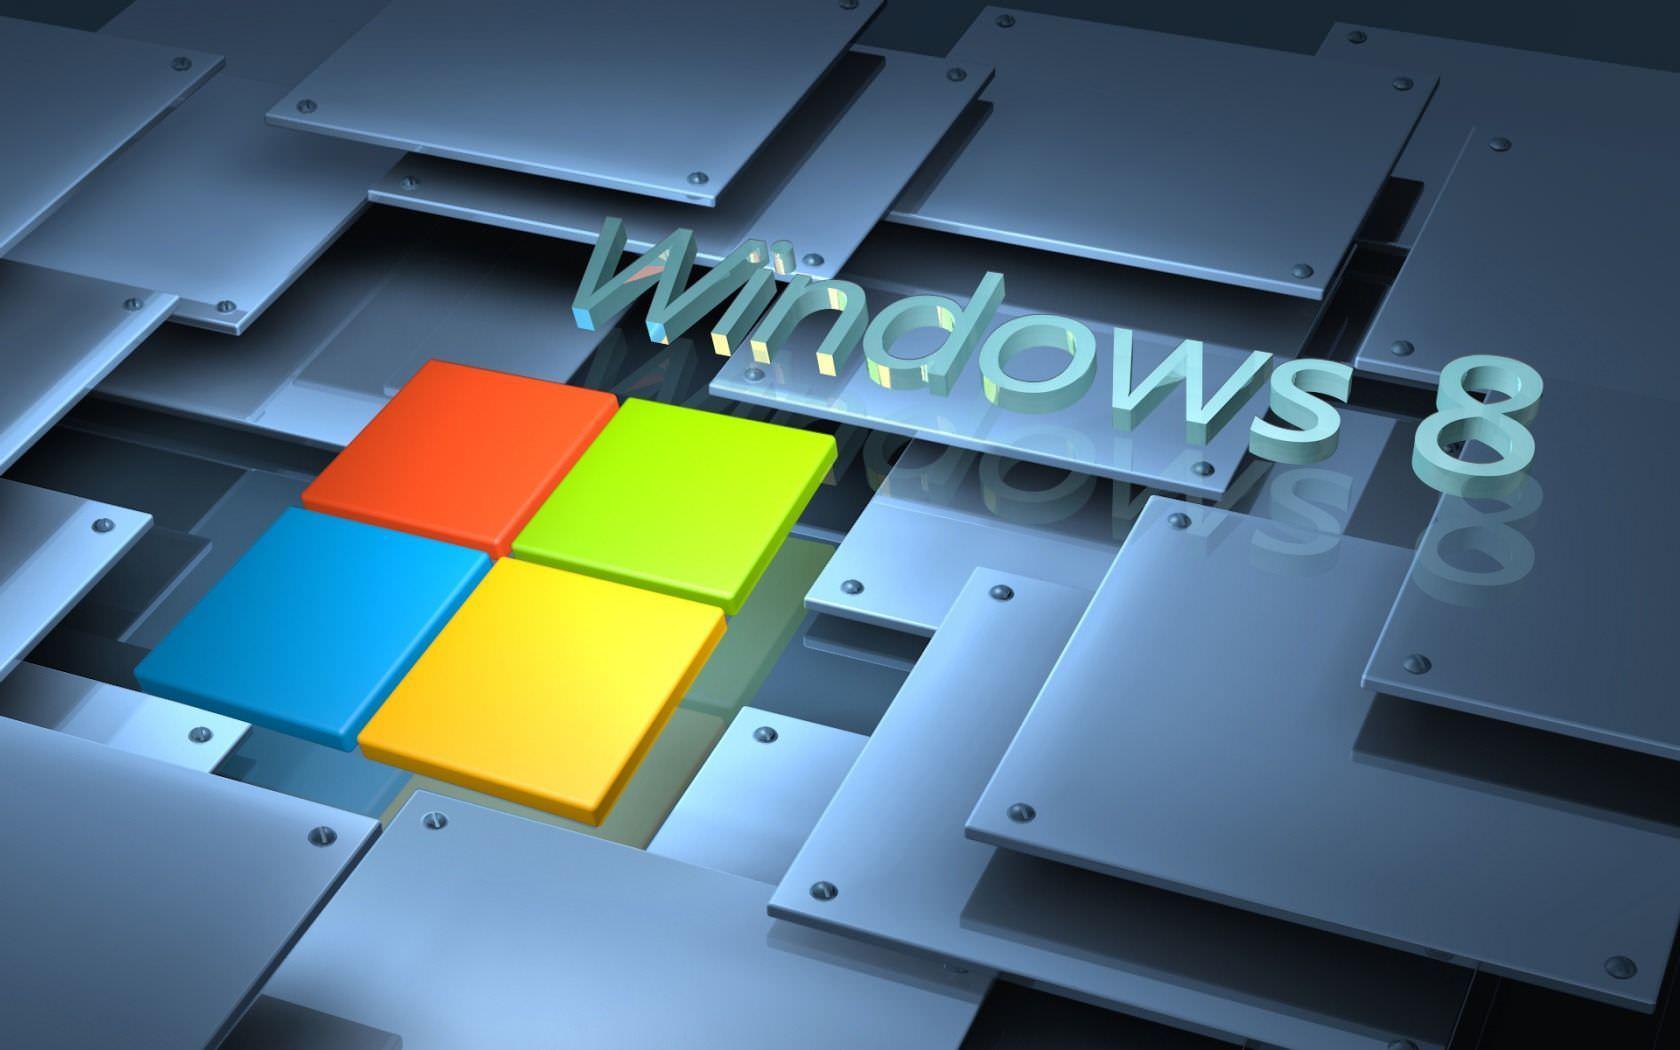 30 3d Windows 8 Wallpapers Images Backgrounds Design